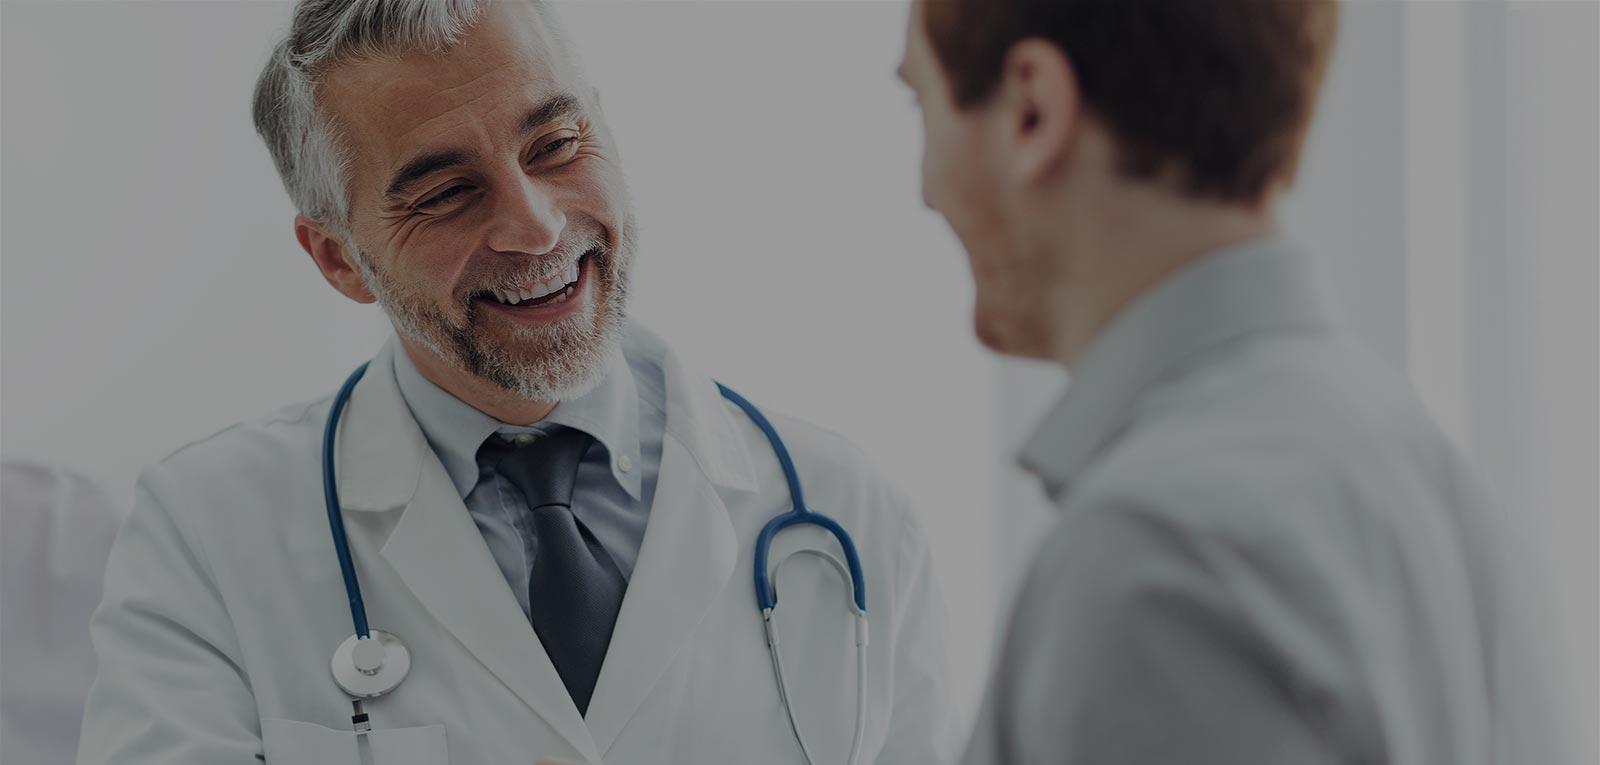 Medreleaf Cannabis Clinics